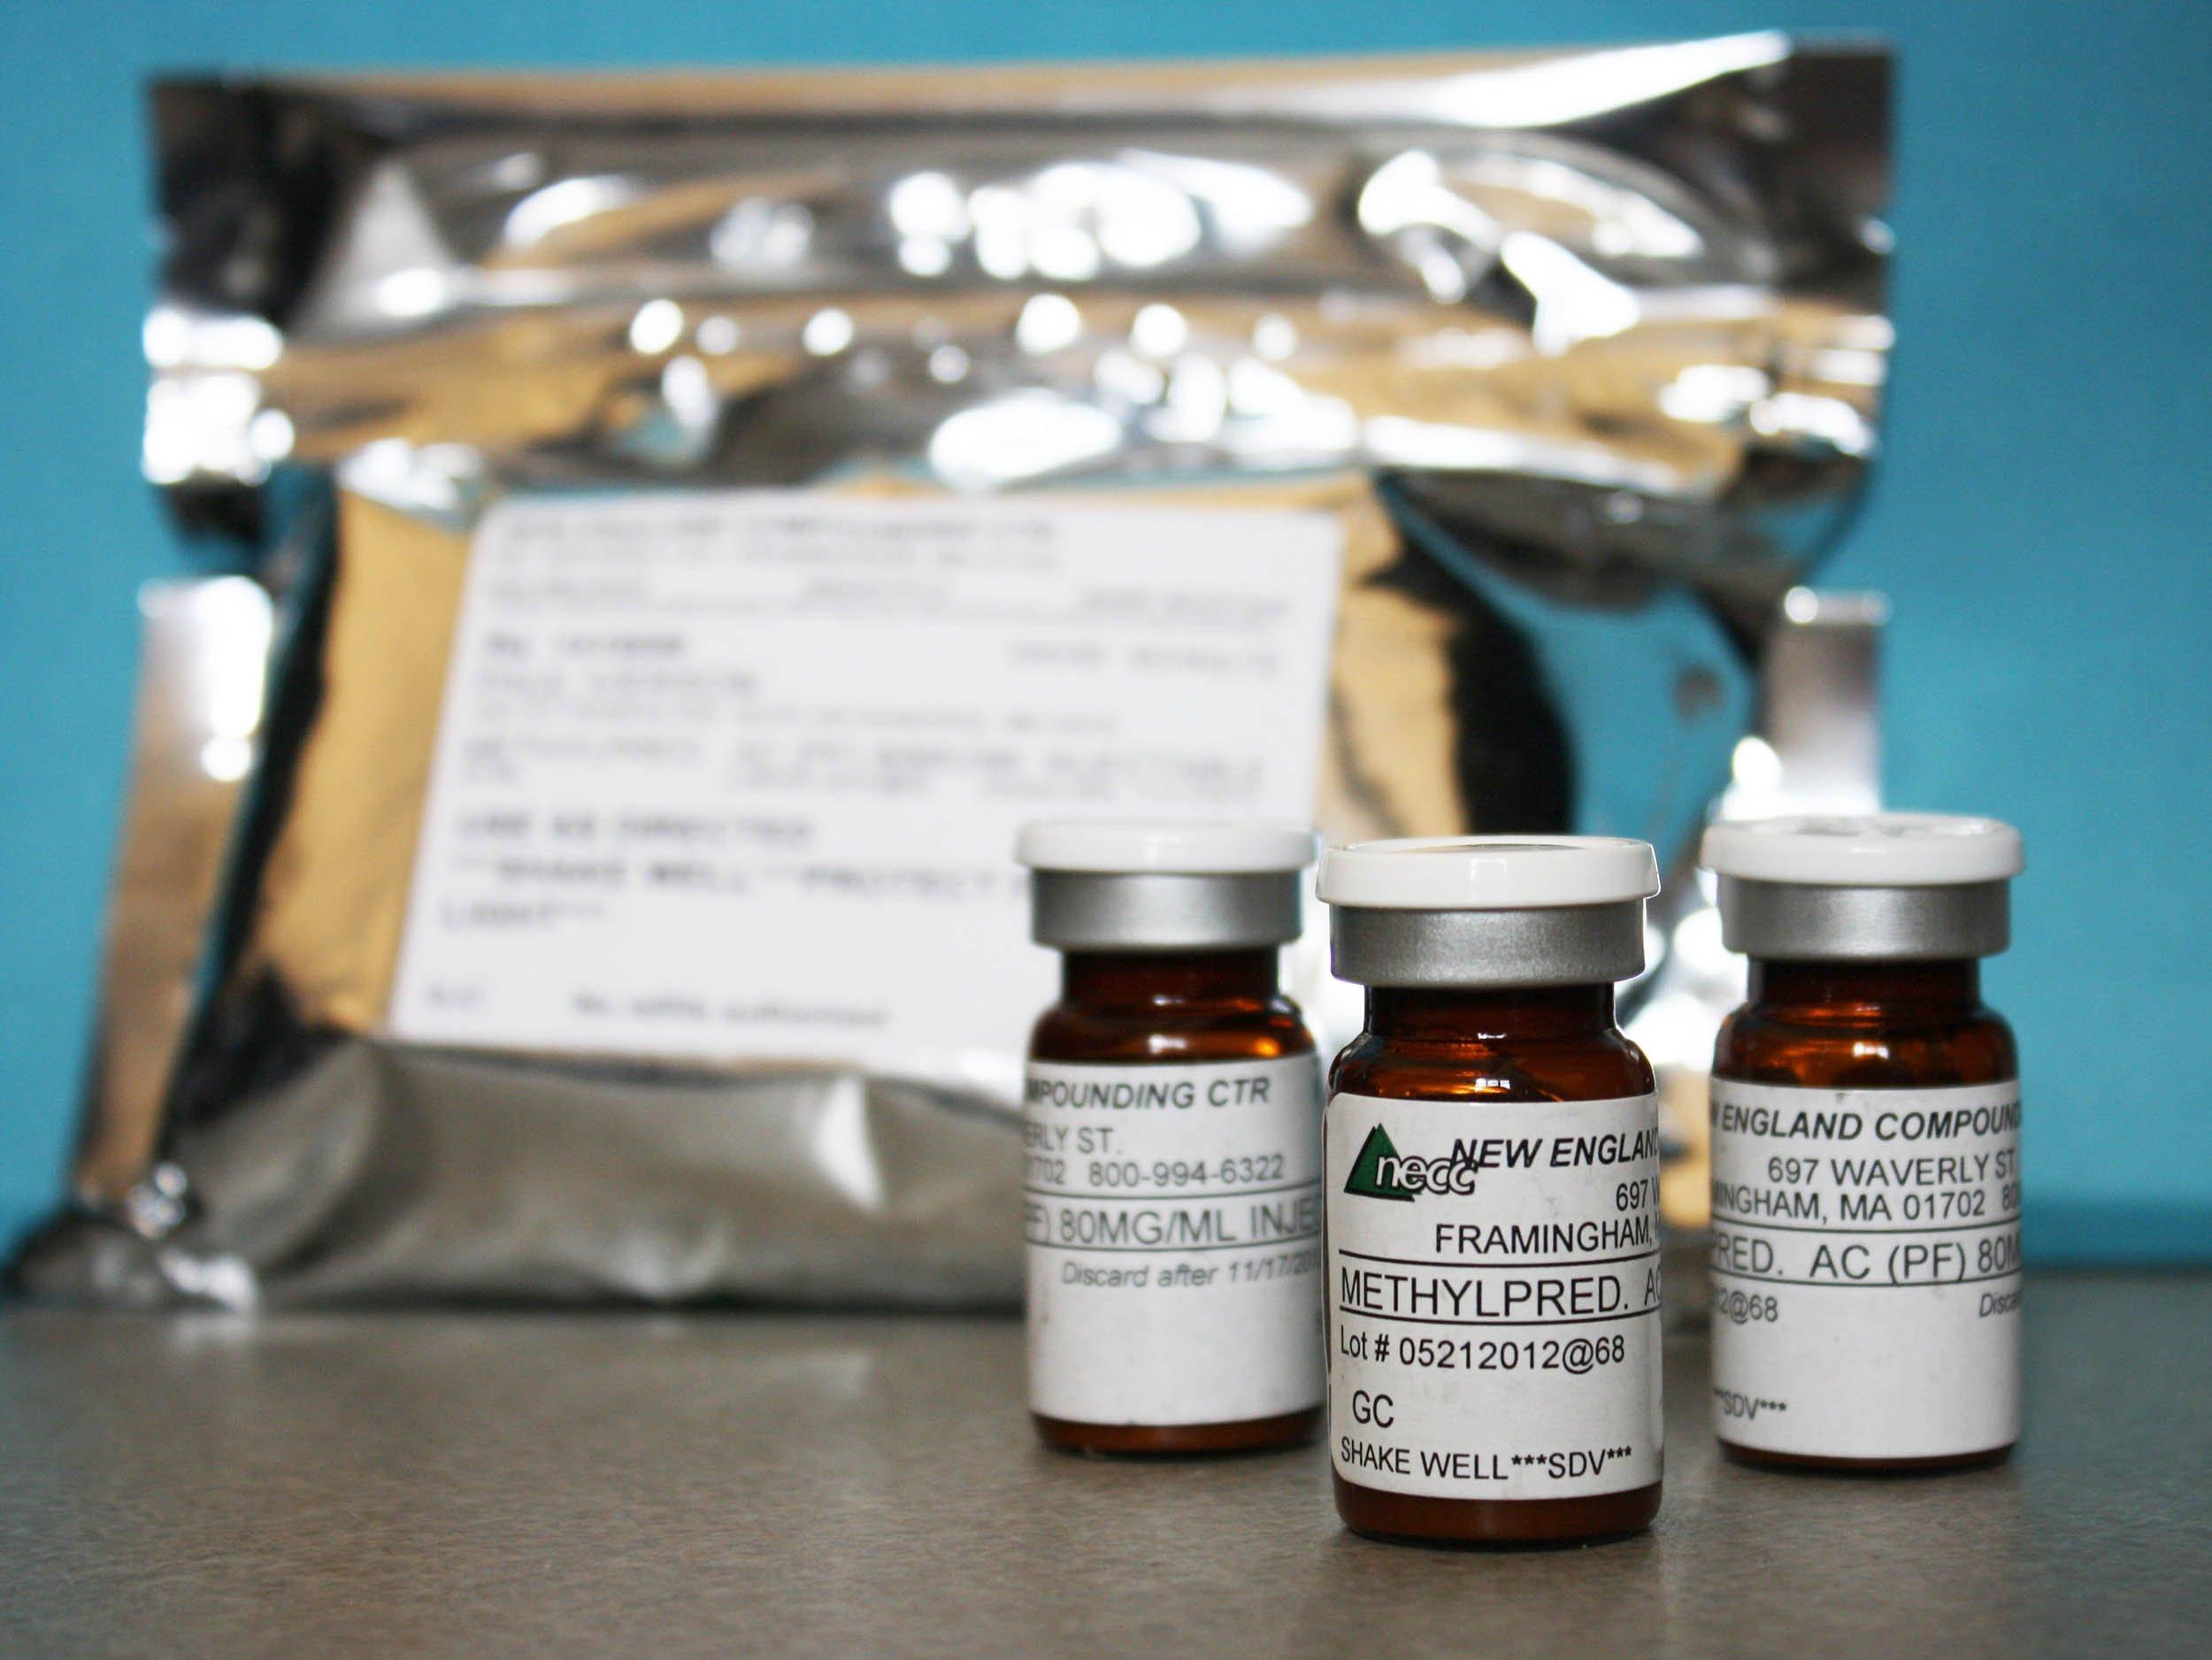 How Do I Get A Product Made Killer Pharmacy Inside A Medical Mass Murder Case